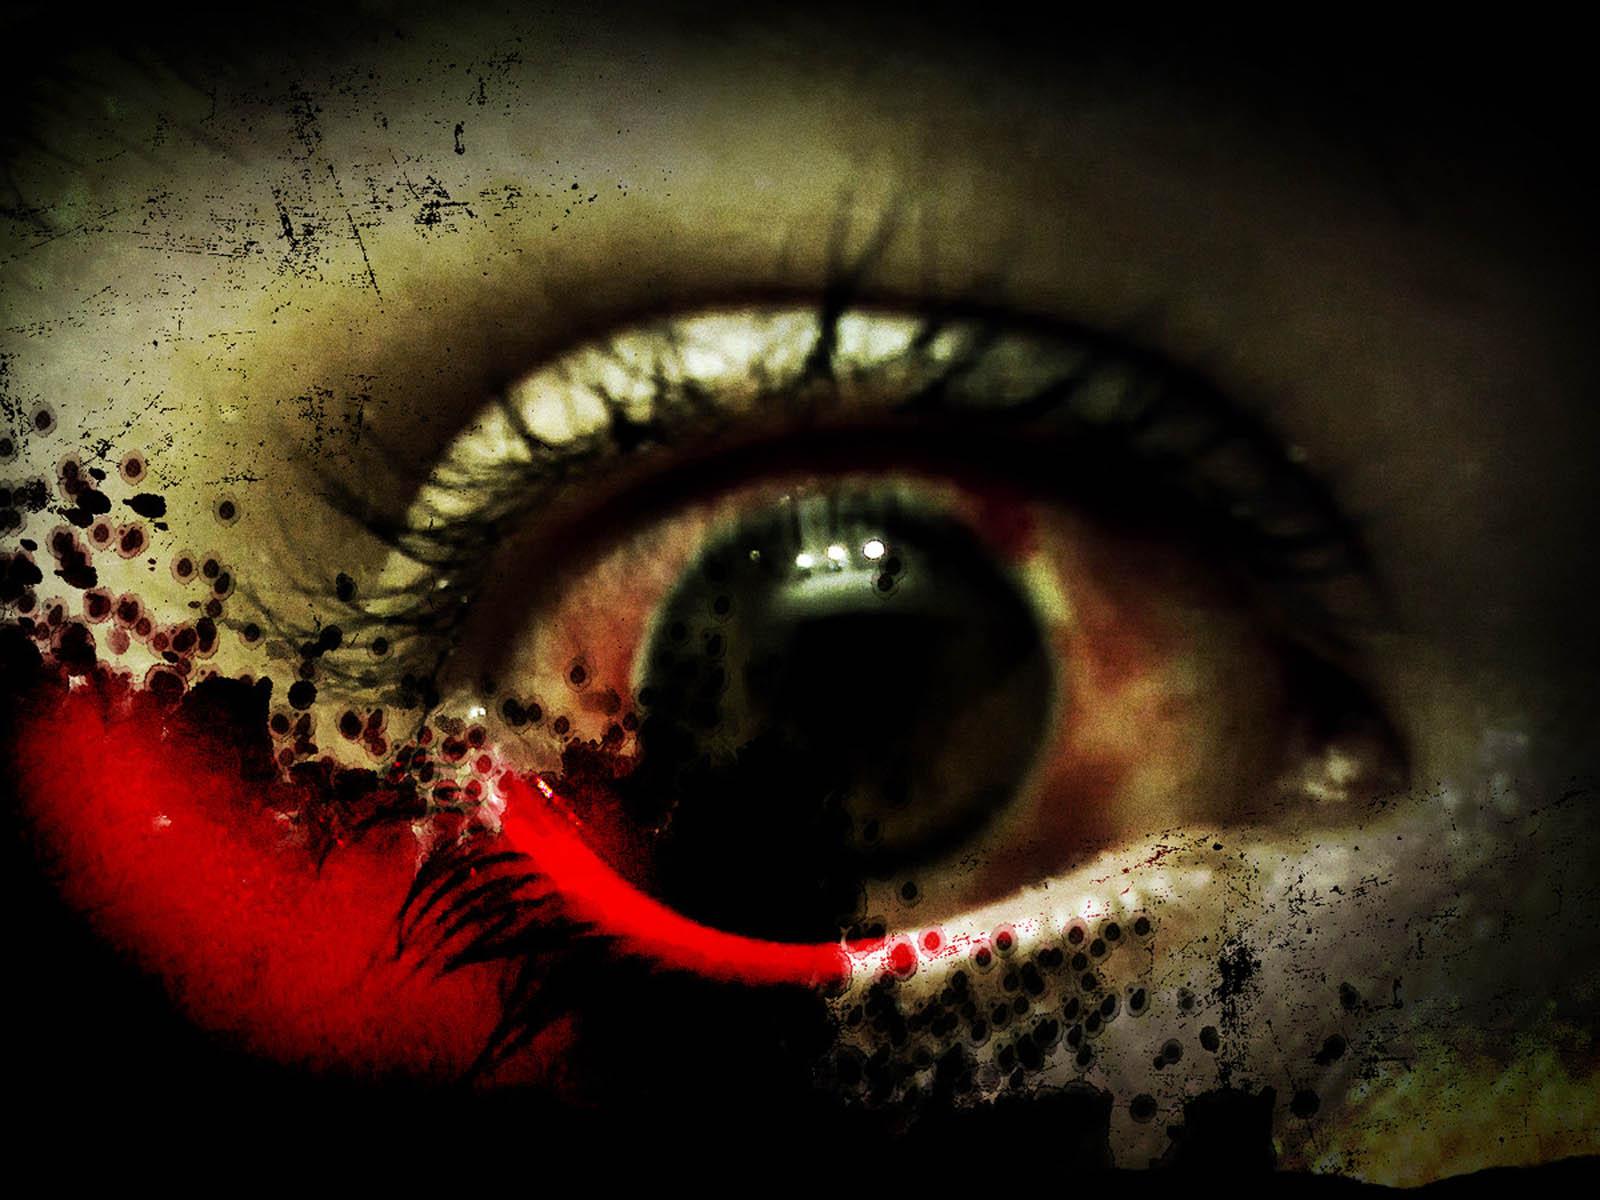 the Horror Eye Wallpapers Horror Eye Desktop Wallpapers Horror 1600x1200